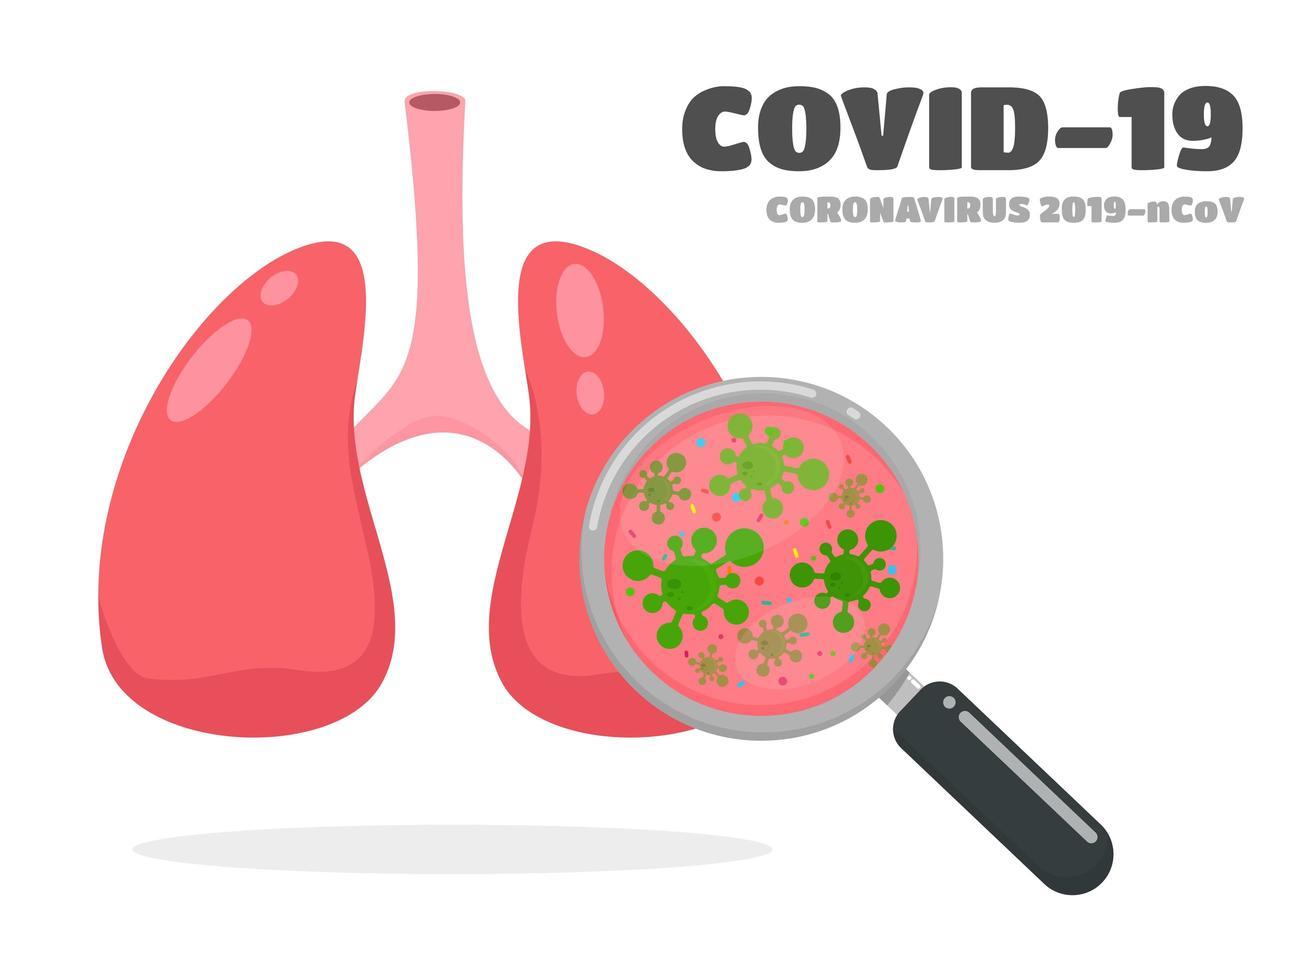 covid-19 o pulmones coronavirus vector